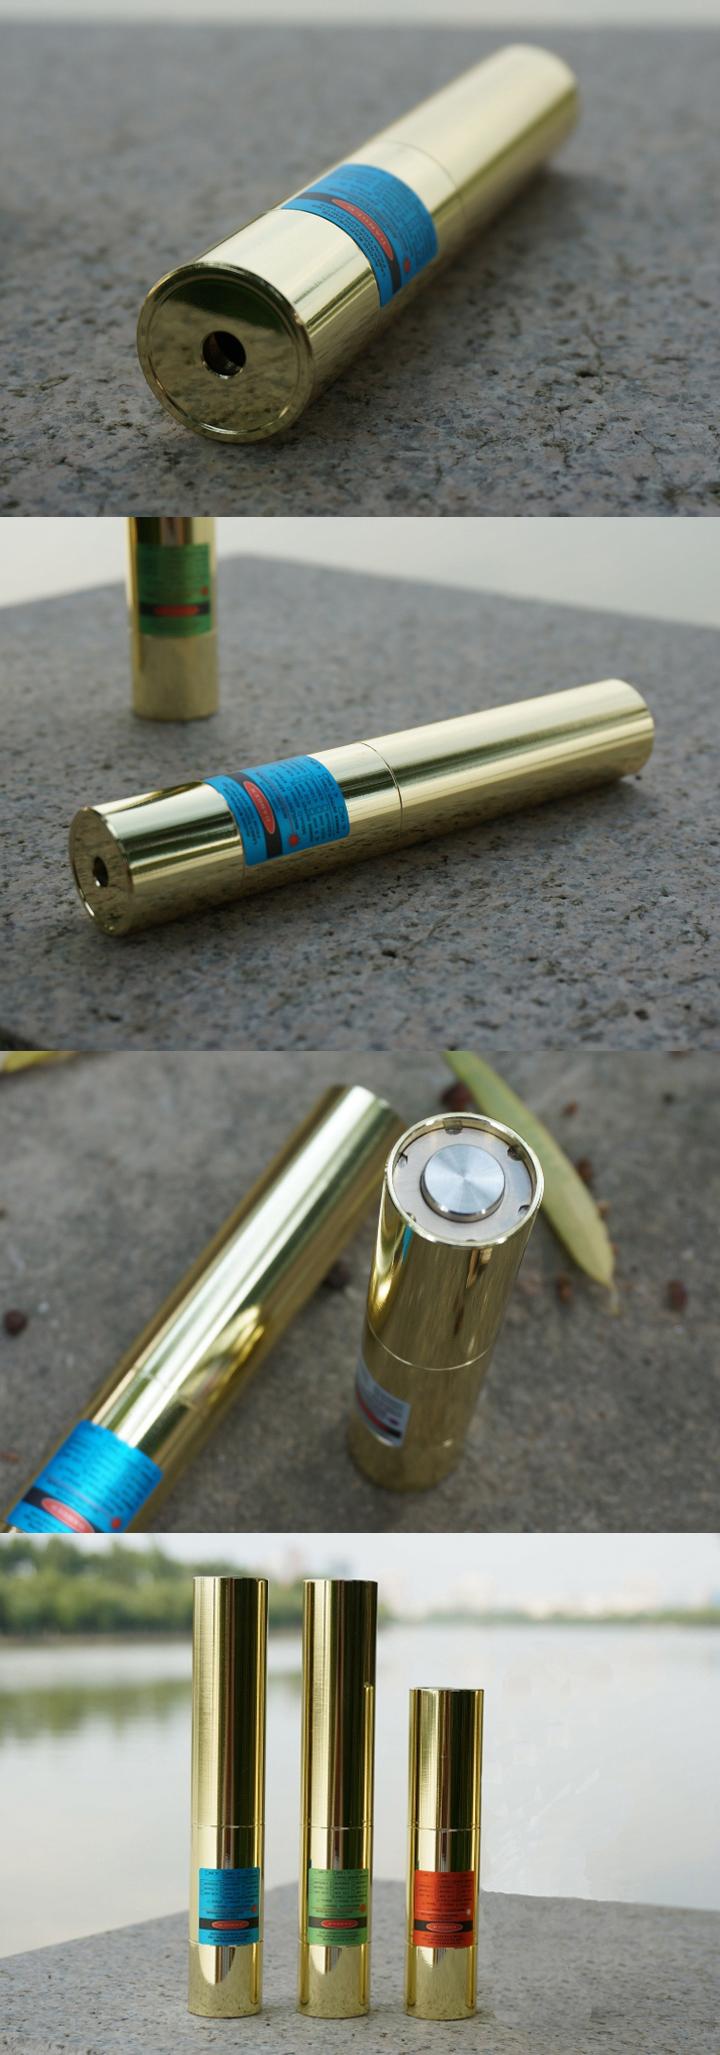 2000mW blauwe laserpen